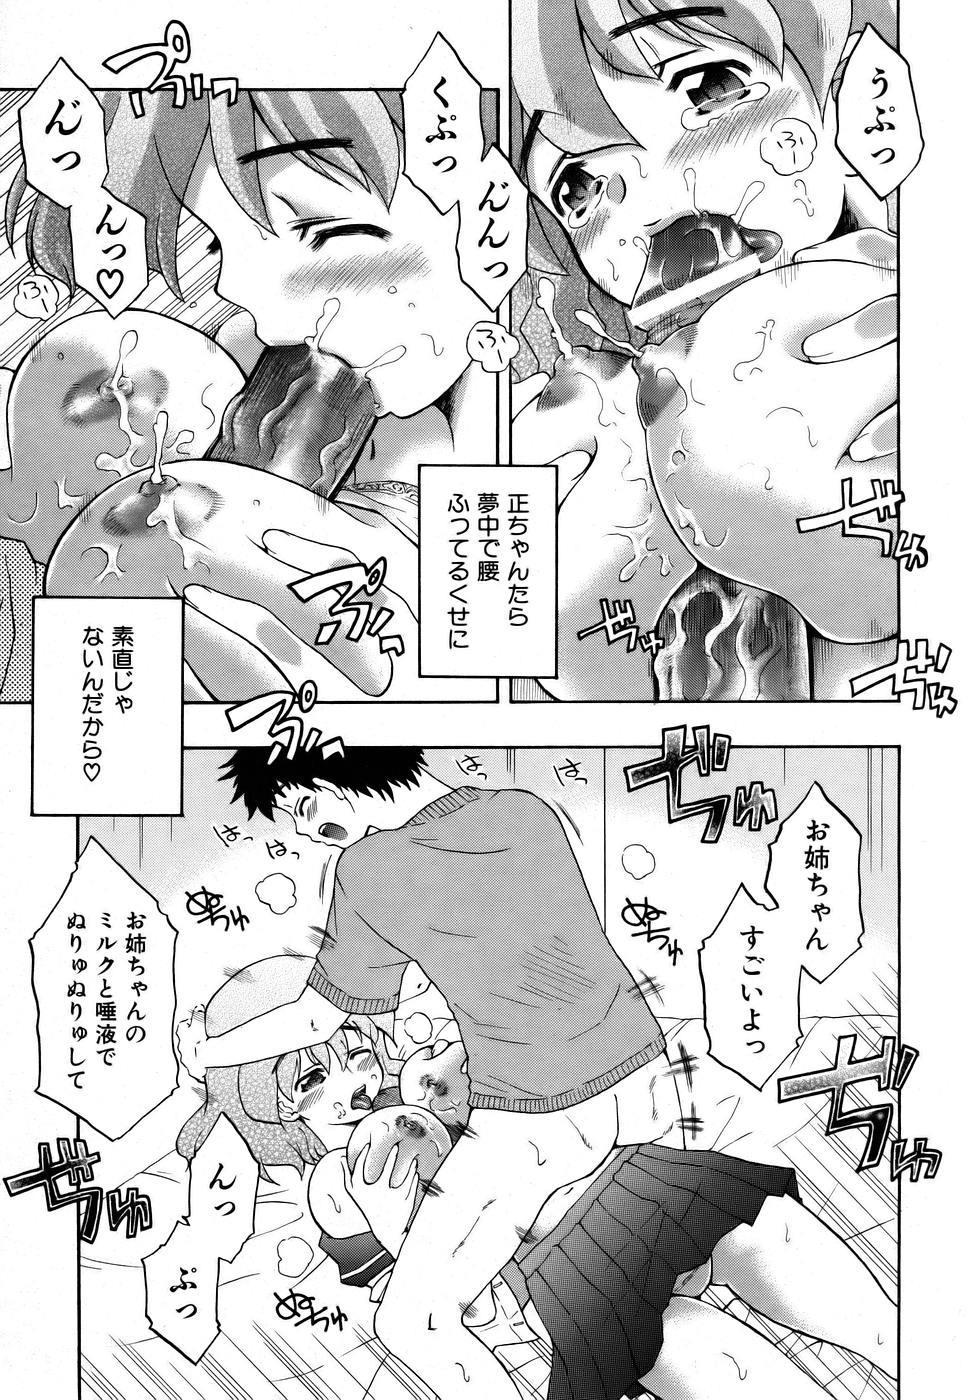 COMIC AUN 2005-12 Vol. 115 388